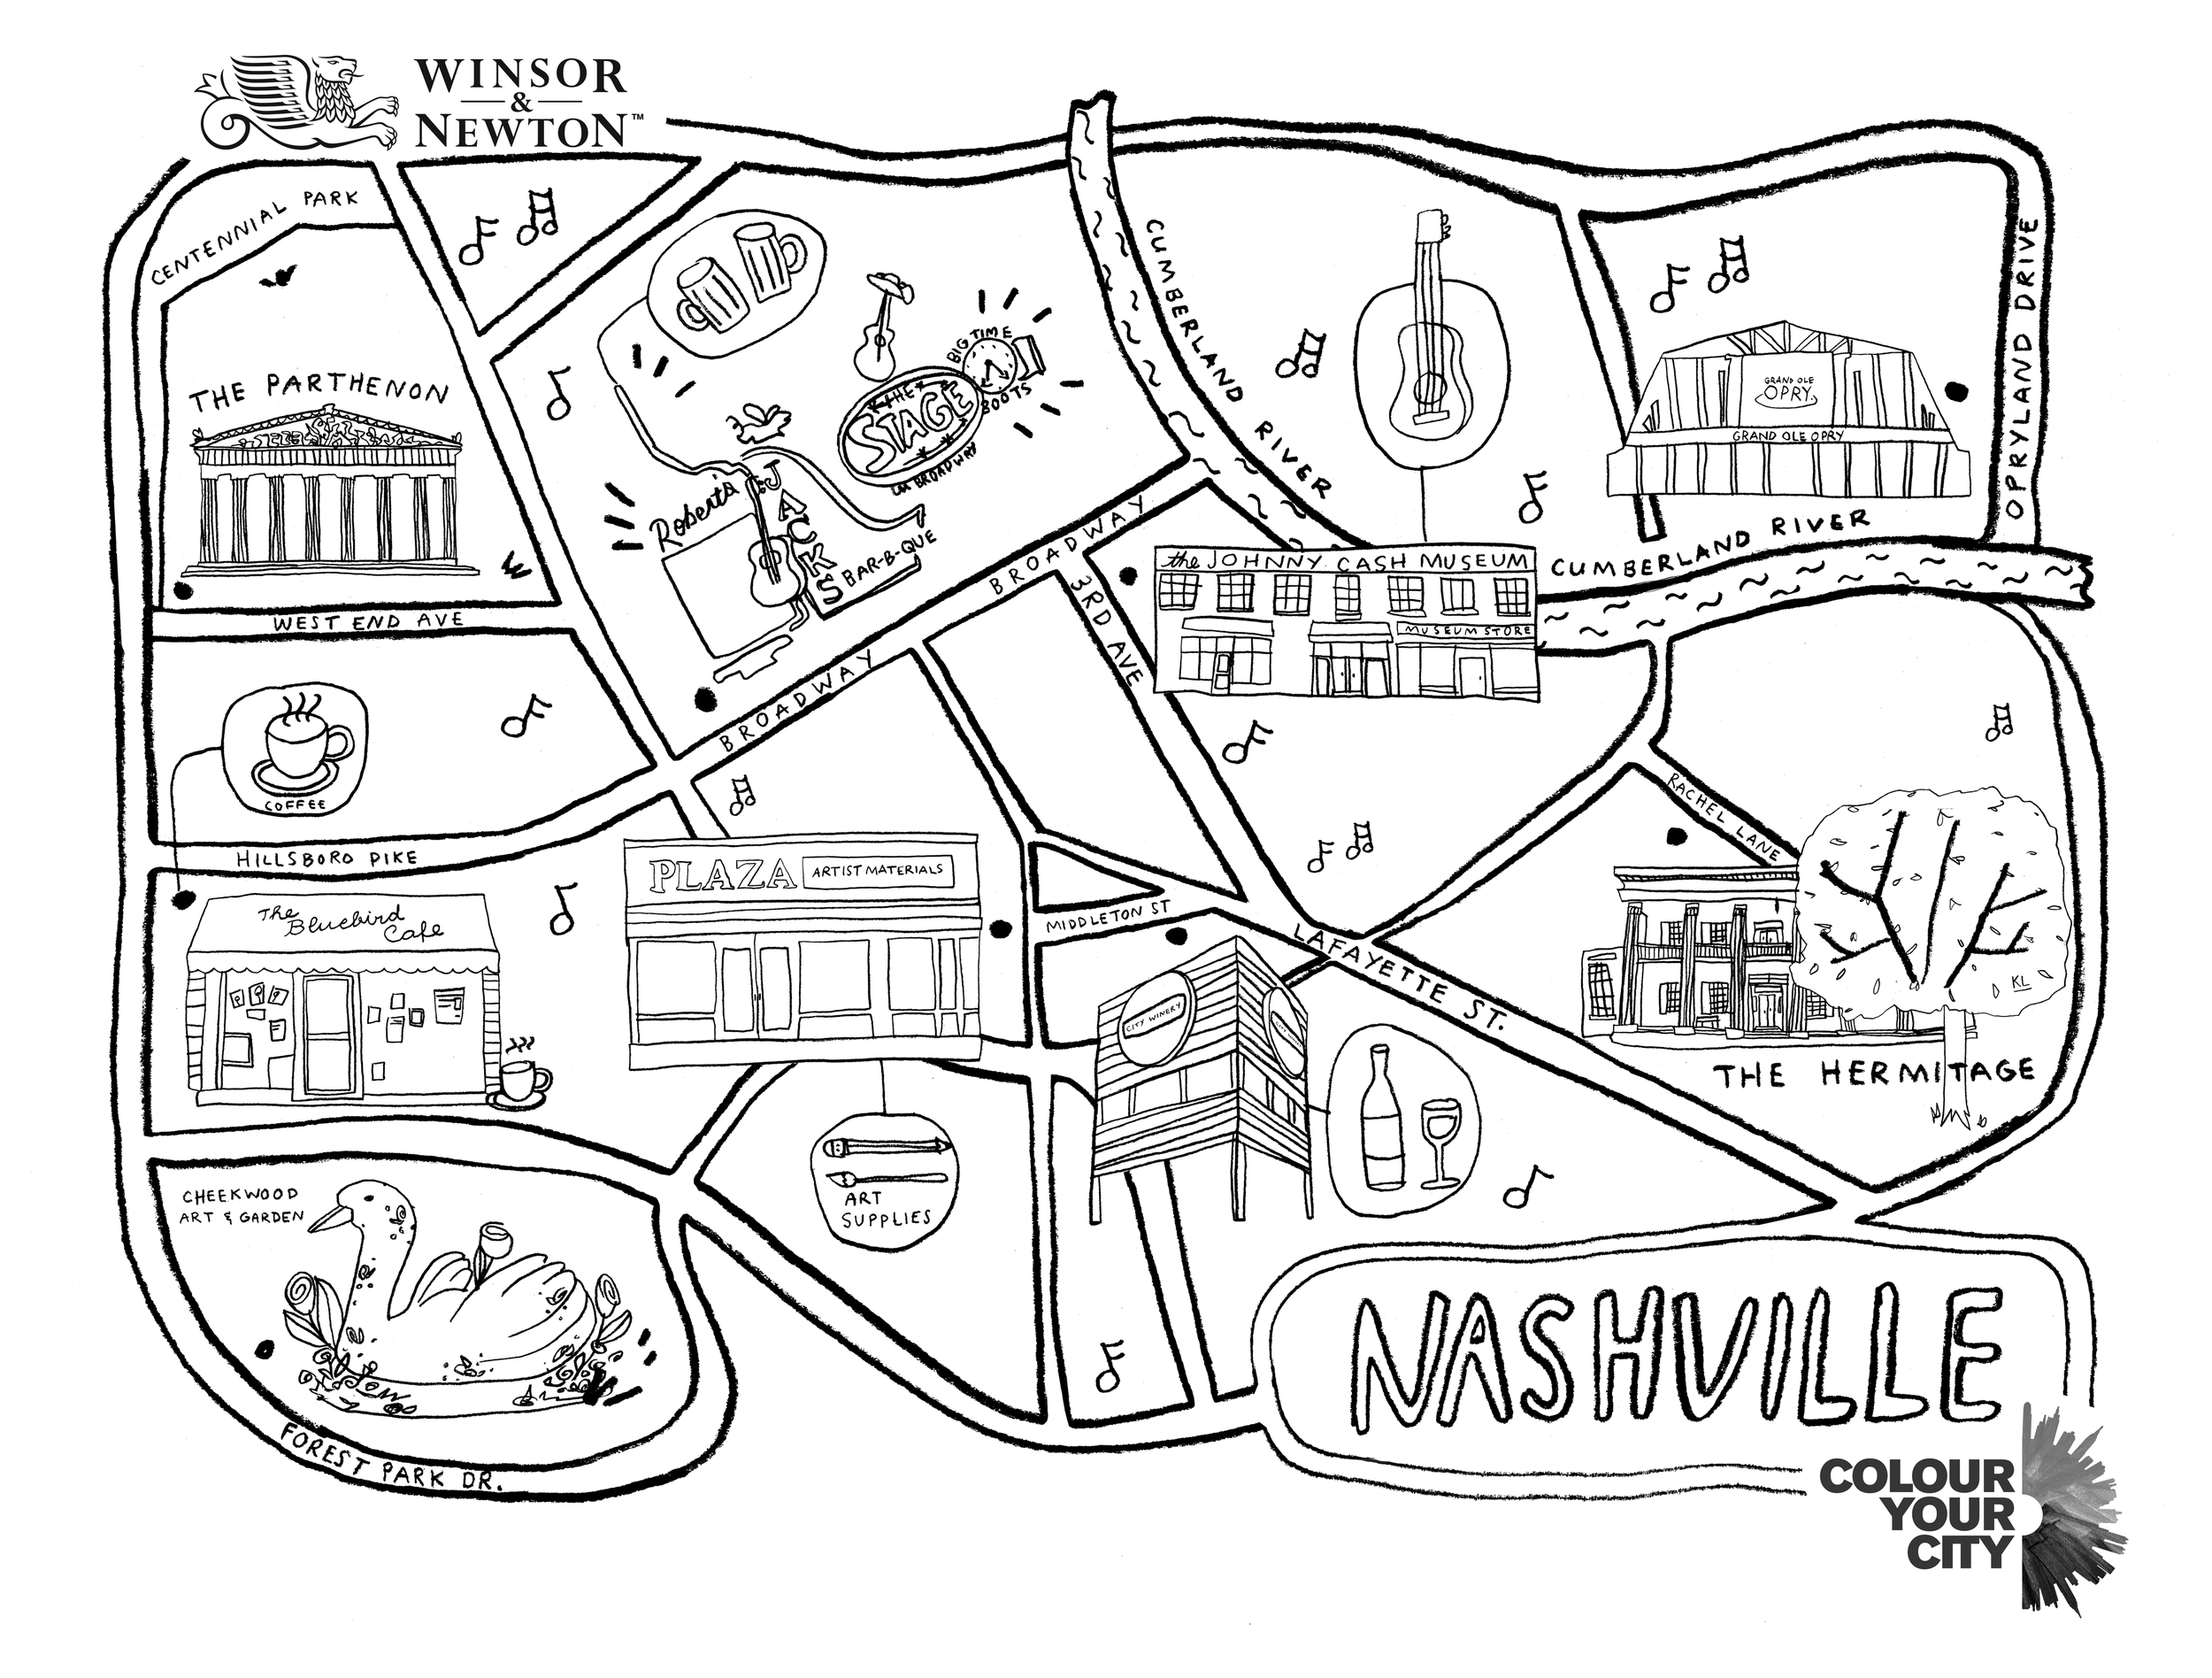 WN_NASHVILLE-MAP_HORIZONTAL.png